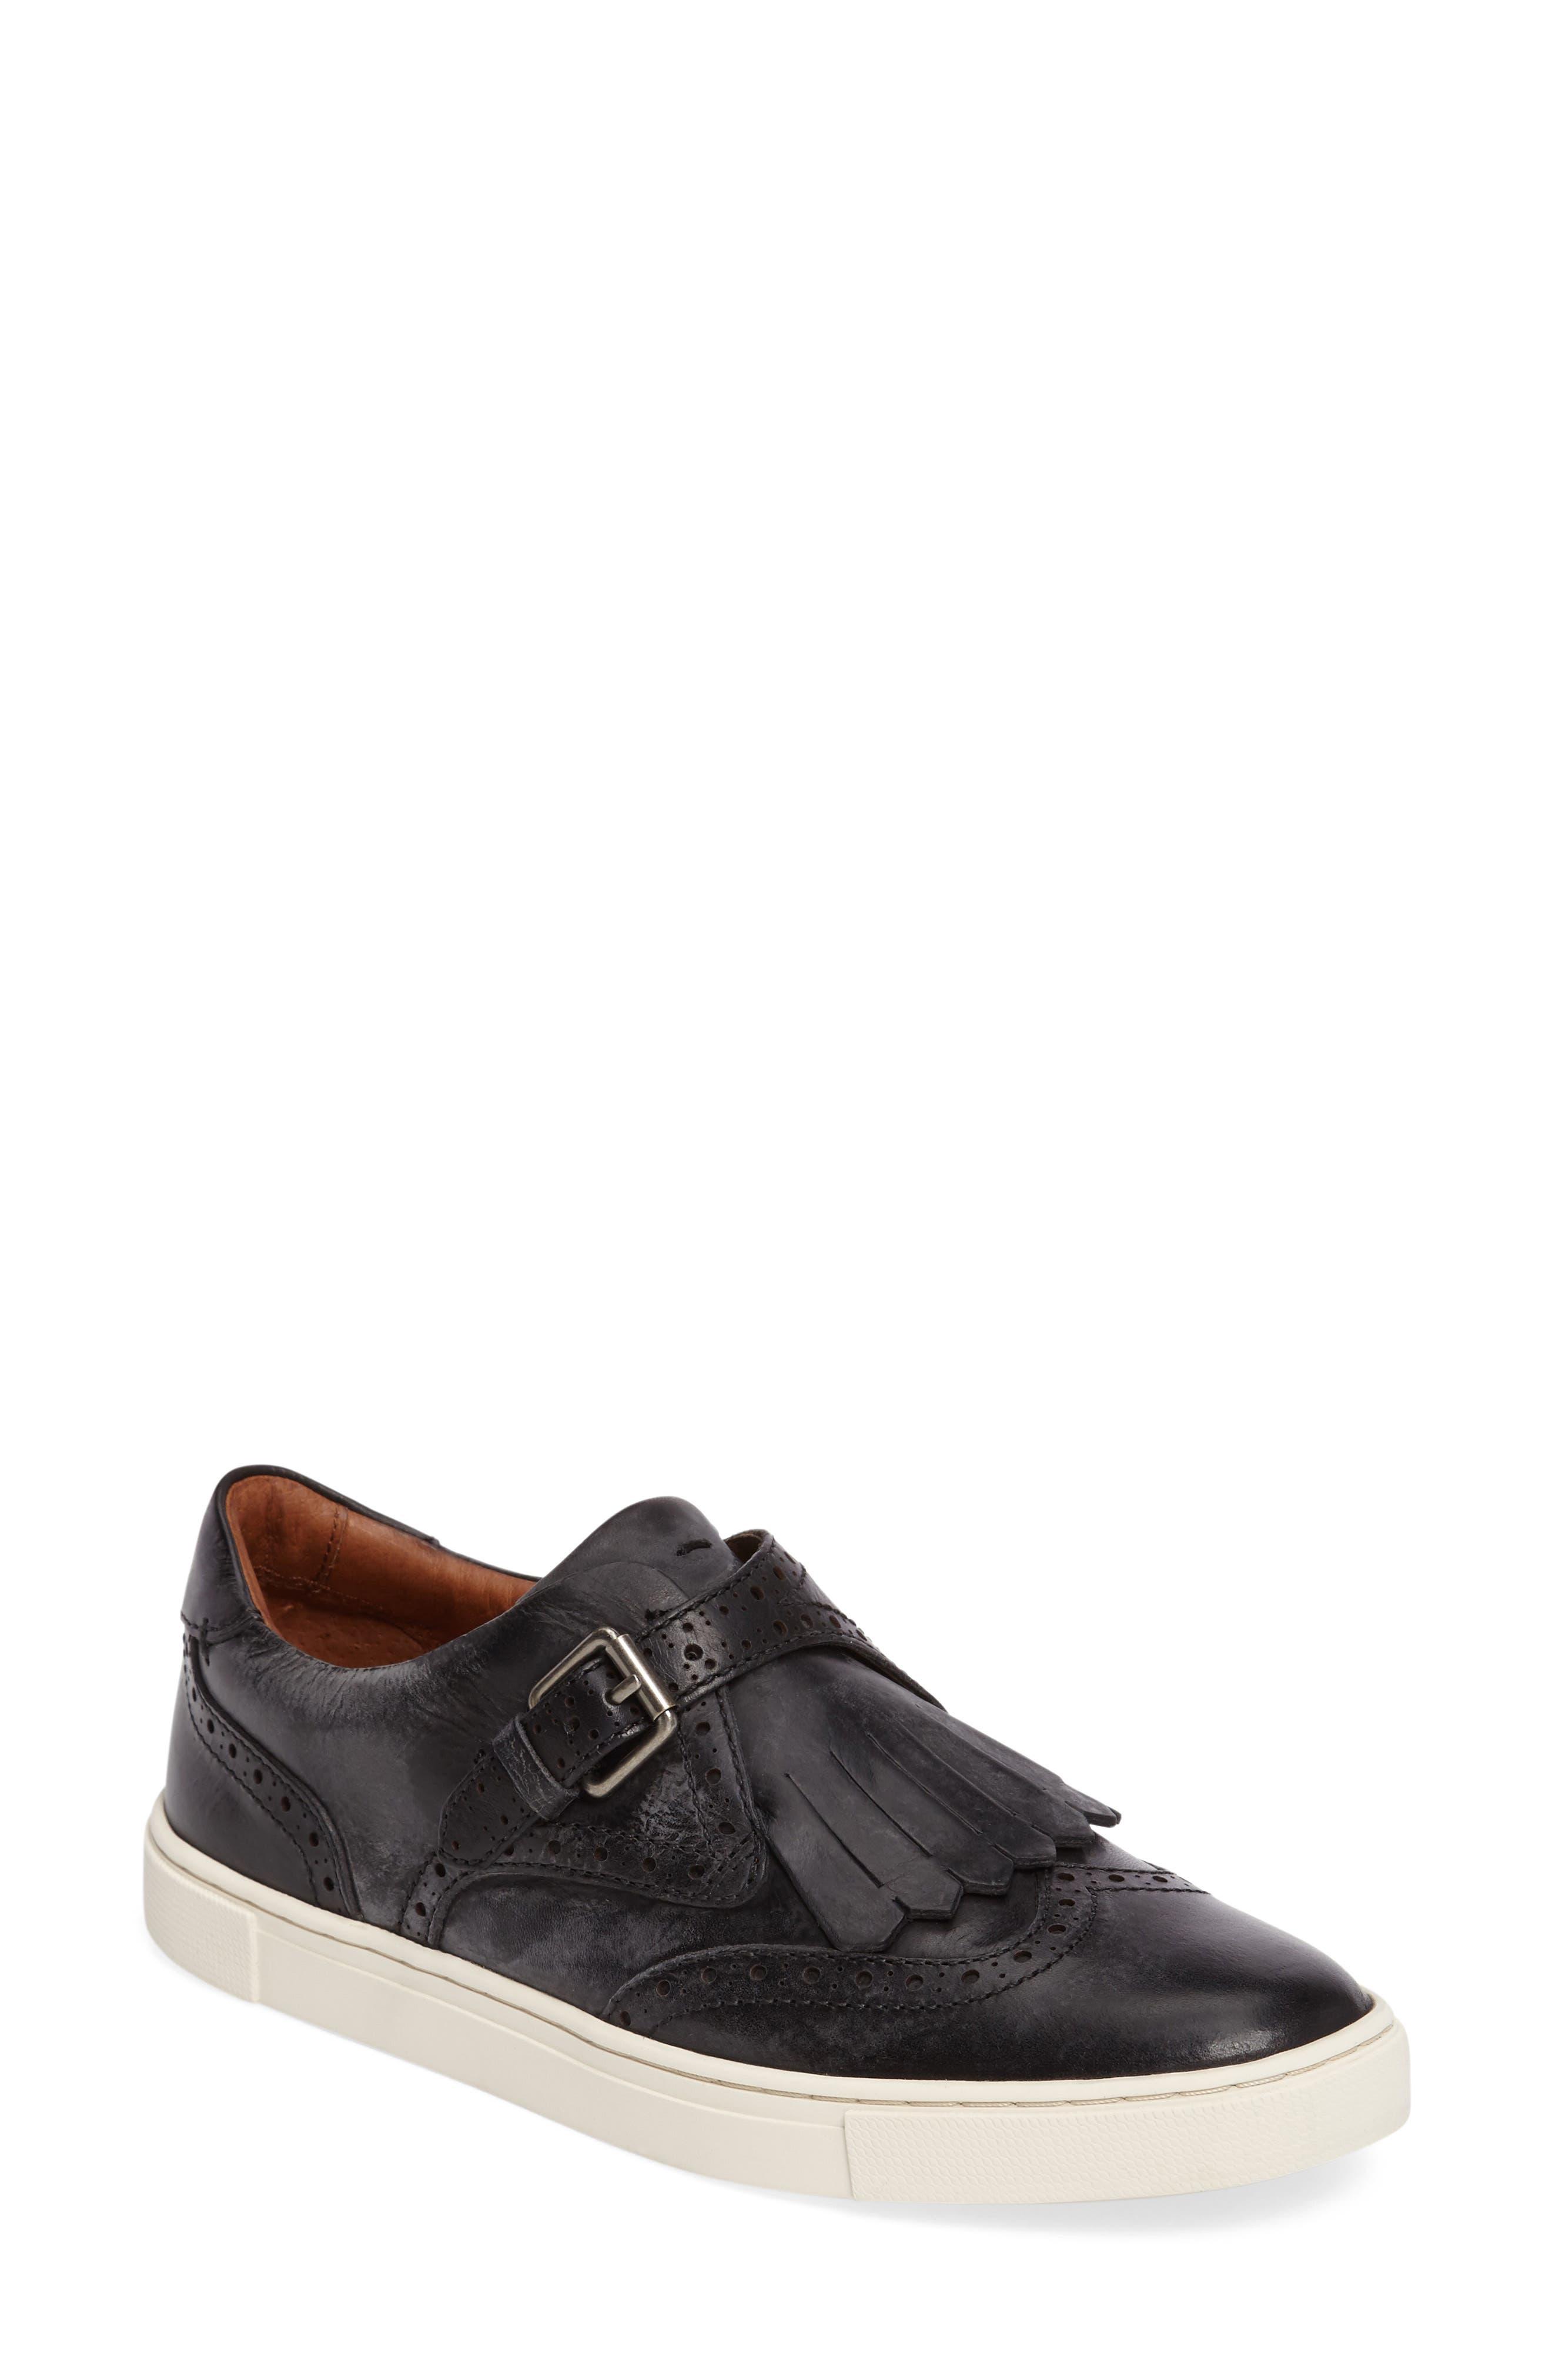 'Gemma' Kiltie Slip On-Sneaker,                             Main thumbnail 1, color,                             001